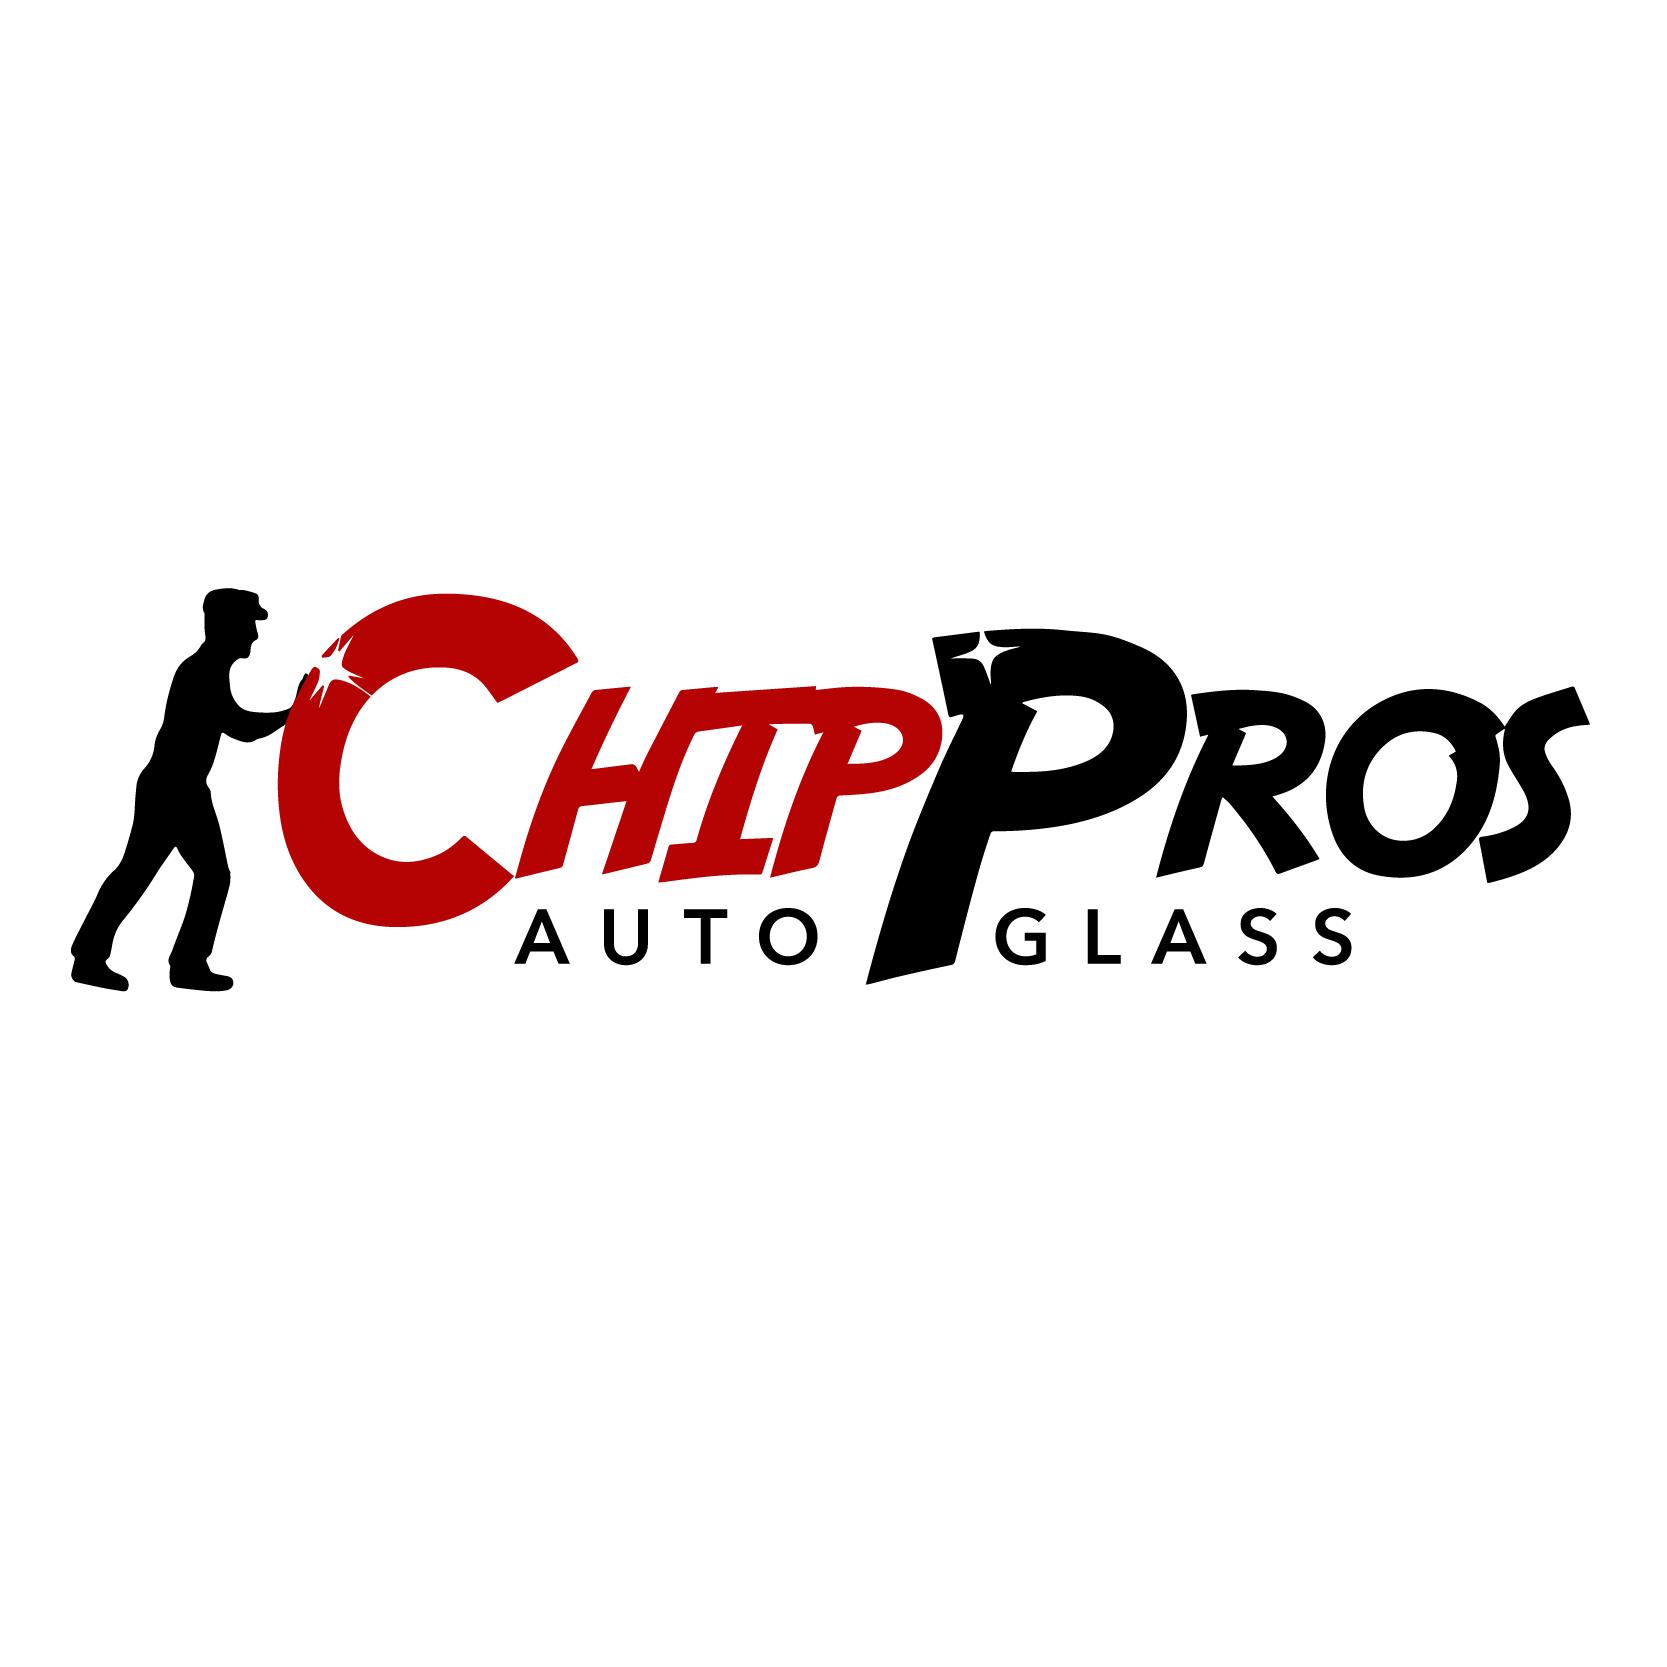 ChipPros Auto Glass Repair